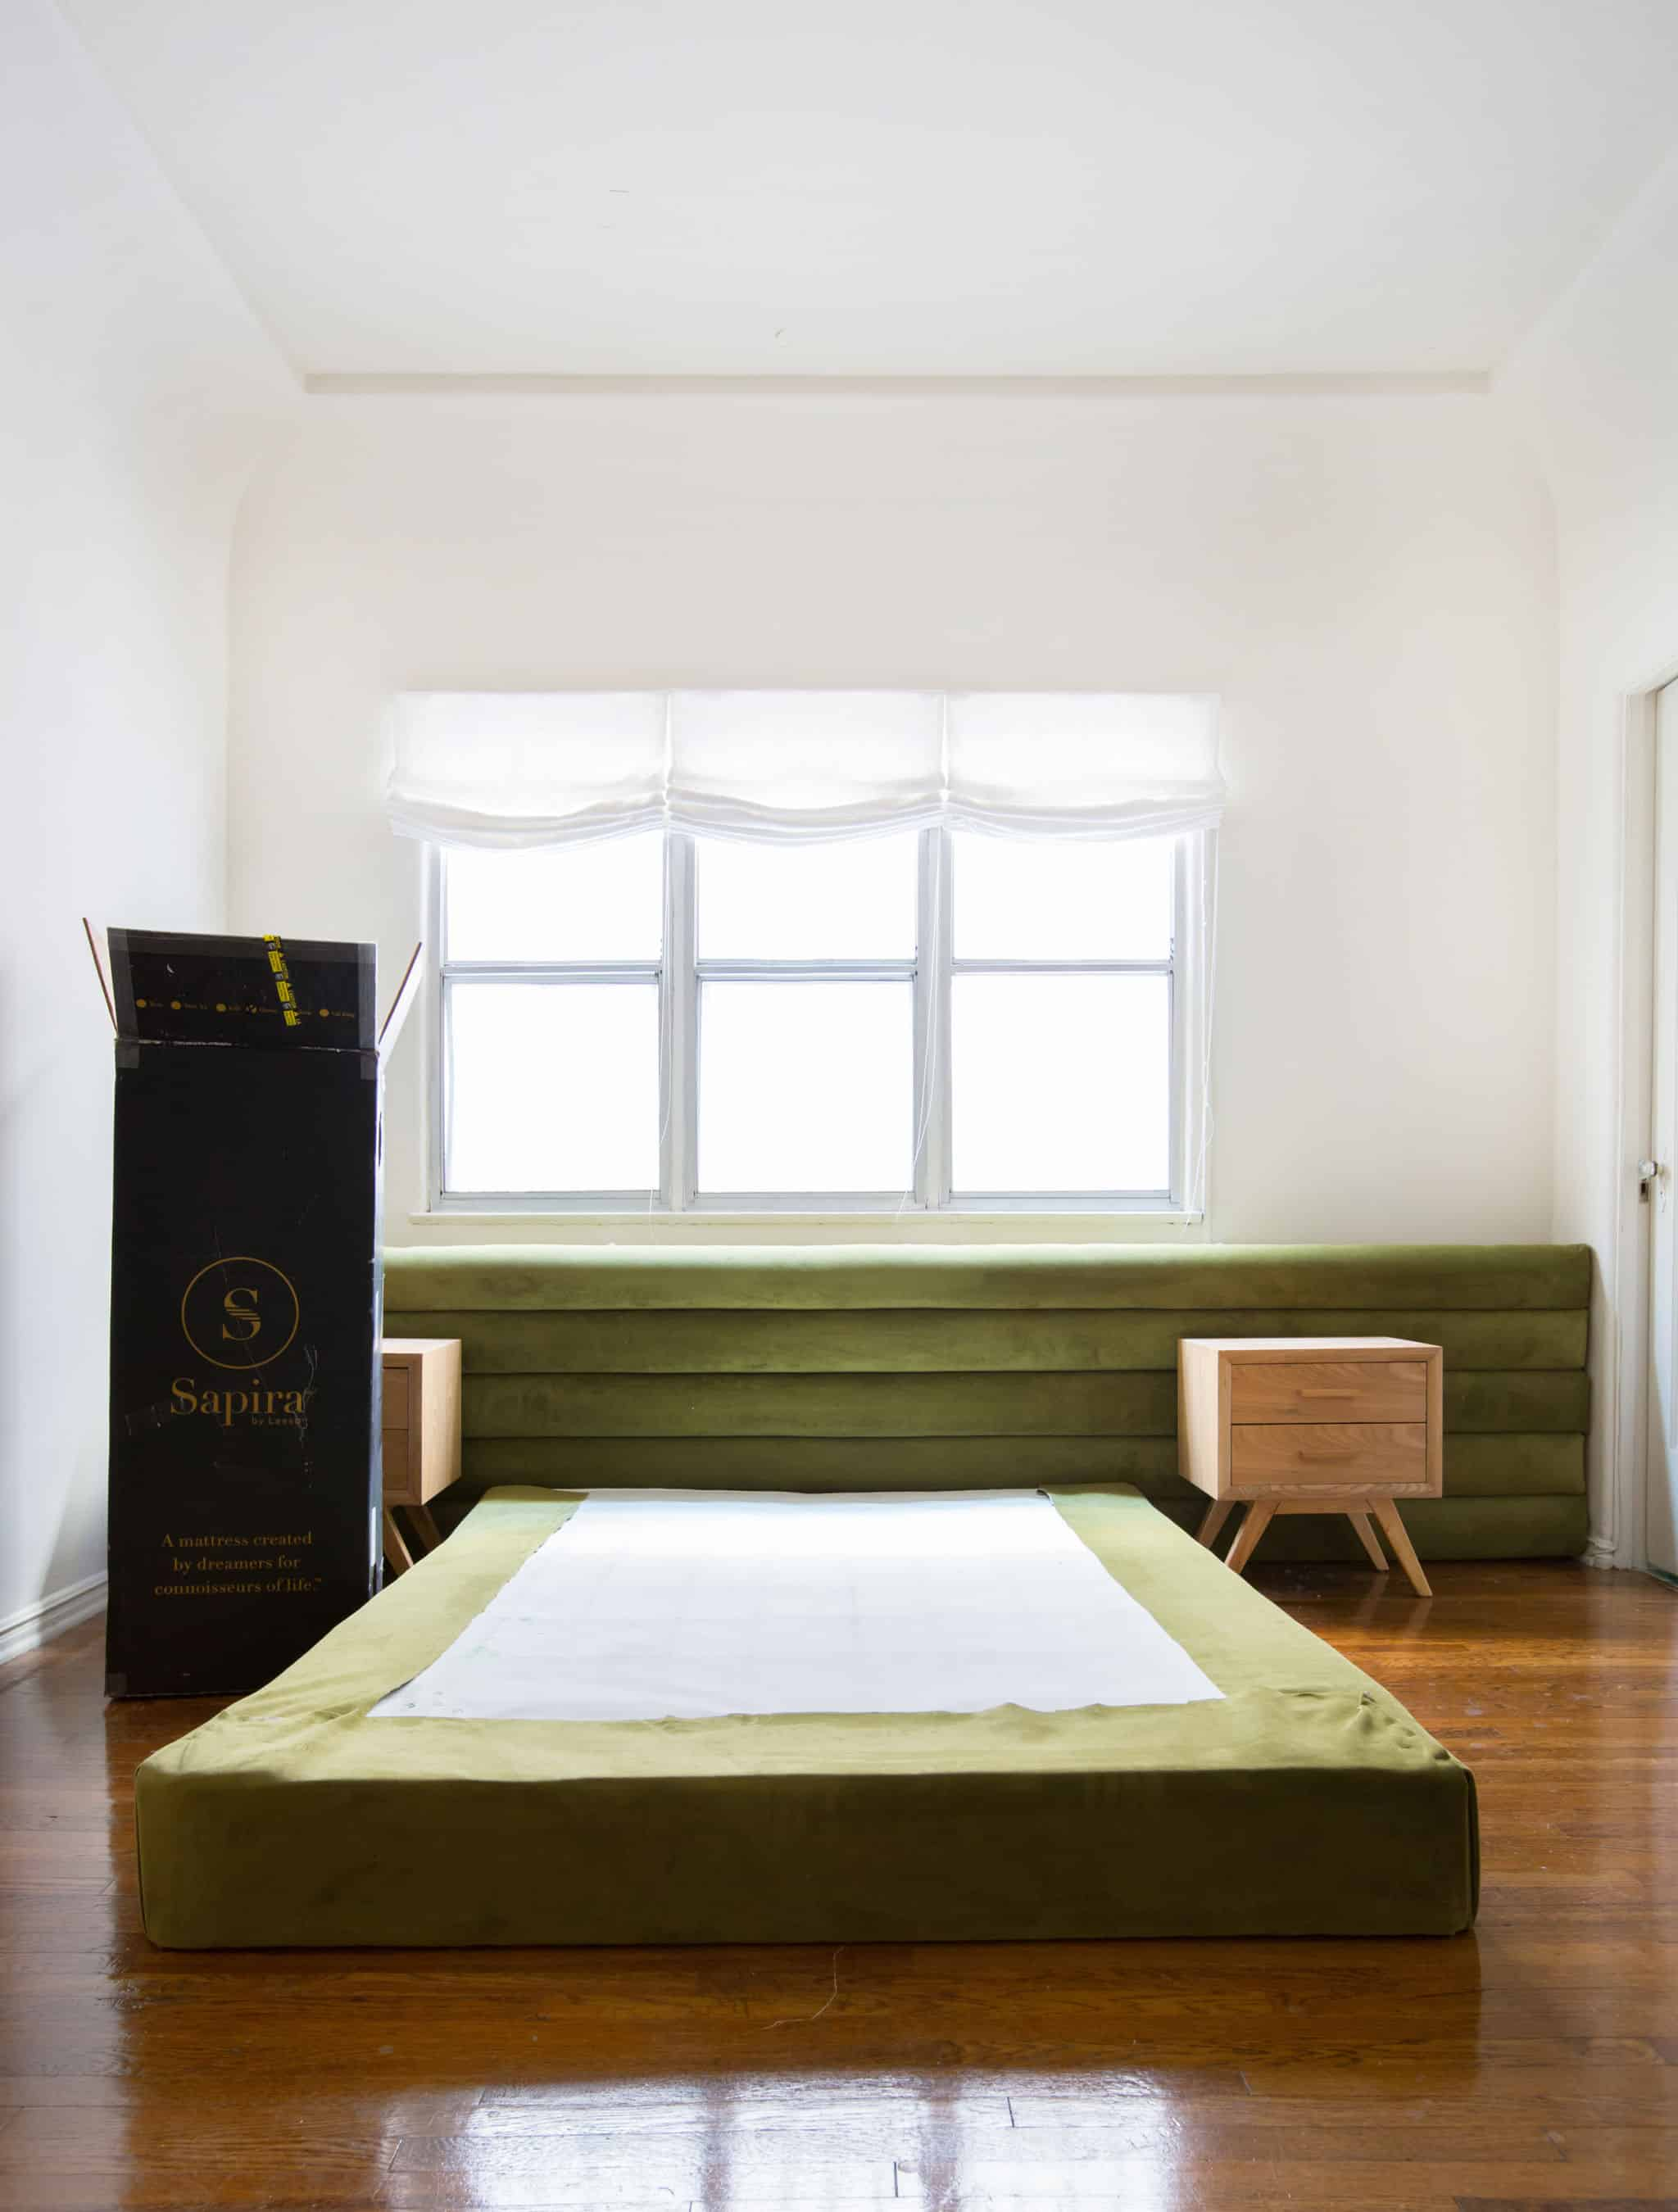 emily-henderson_sapira-mattress_diy-headboard_brady-tolbert_bedroom_green-velvet_channel-tufting_channel-tufted_masculine_boho_chic_headboard_1